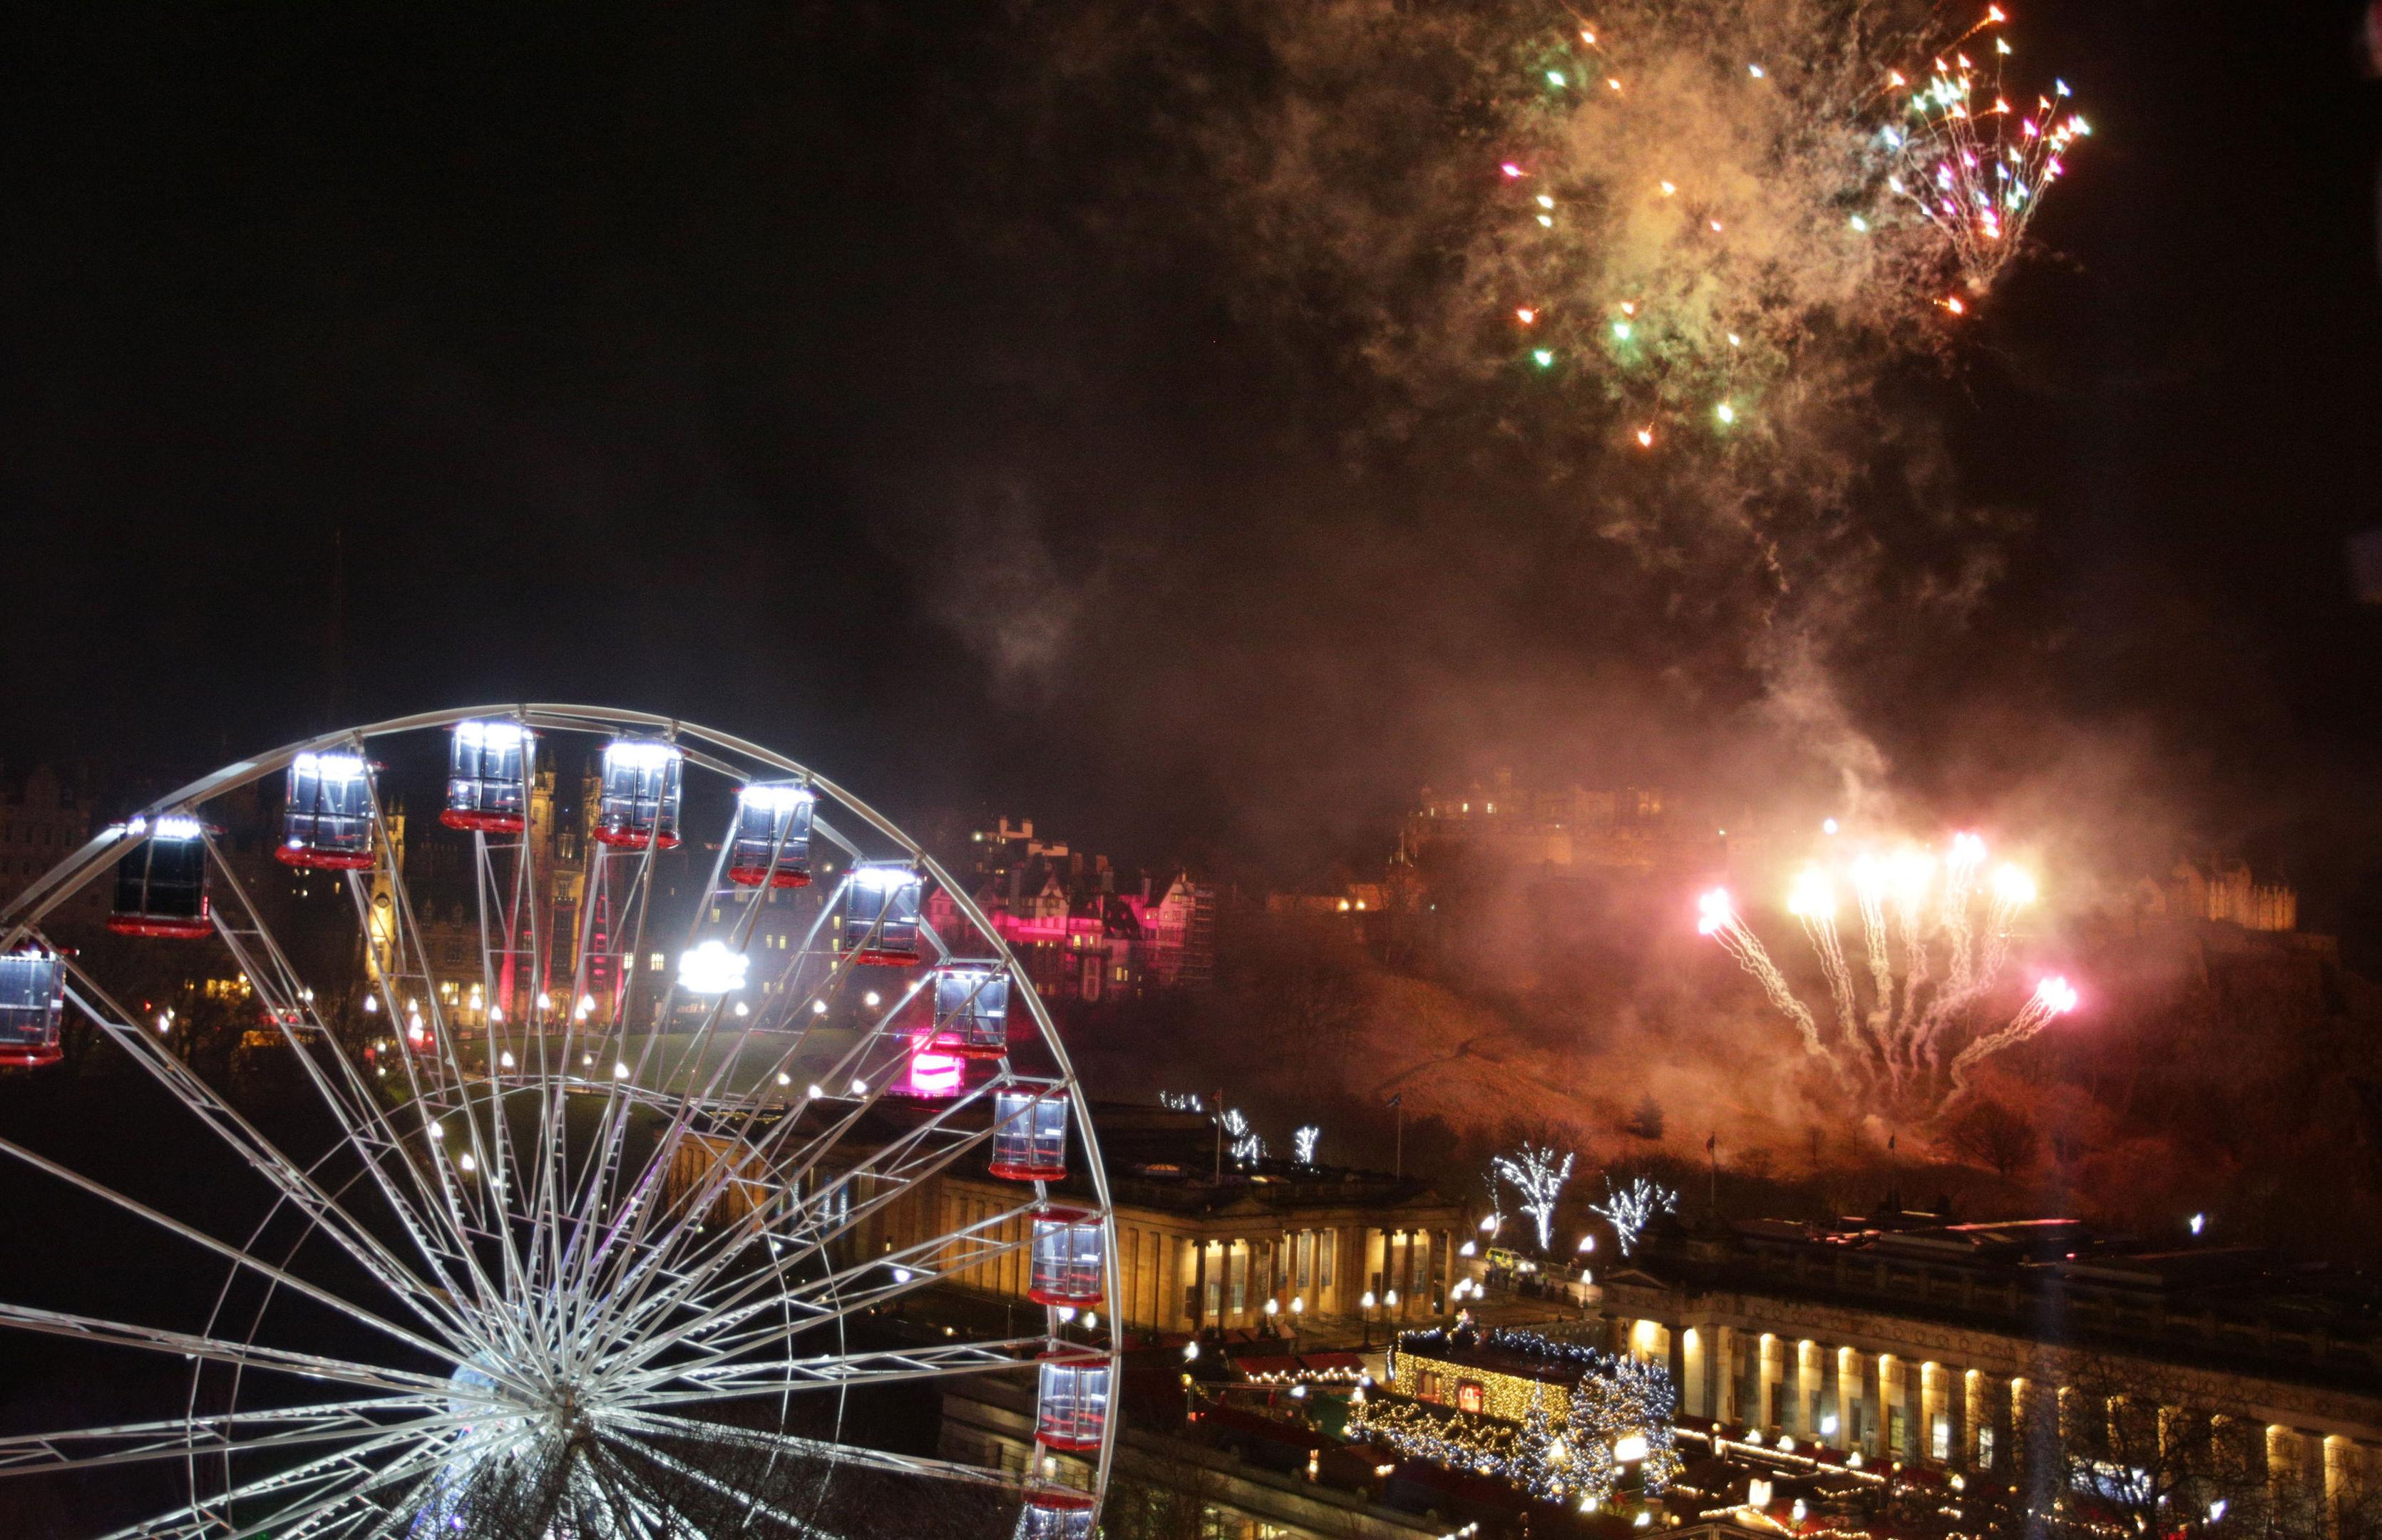 Fireworks light up the sky in Edinburgh